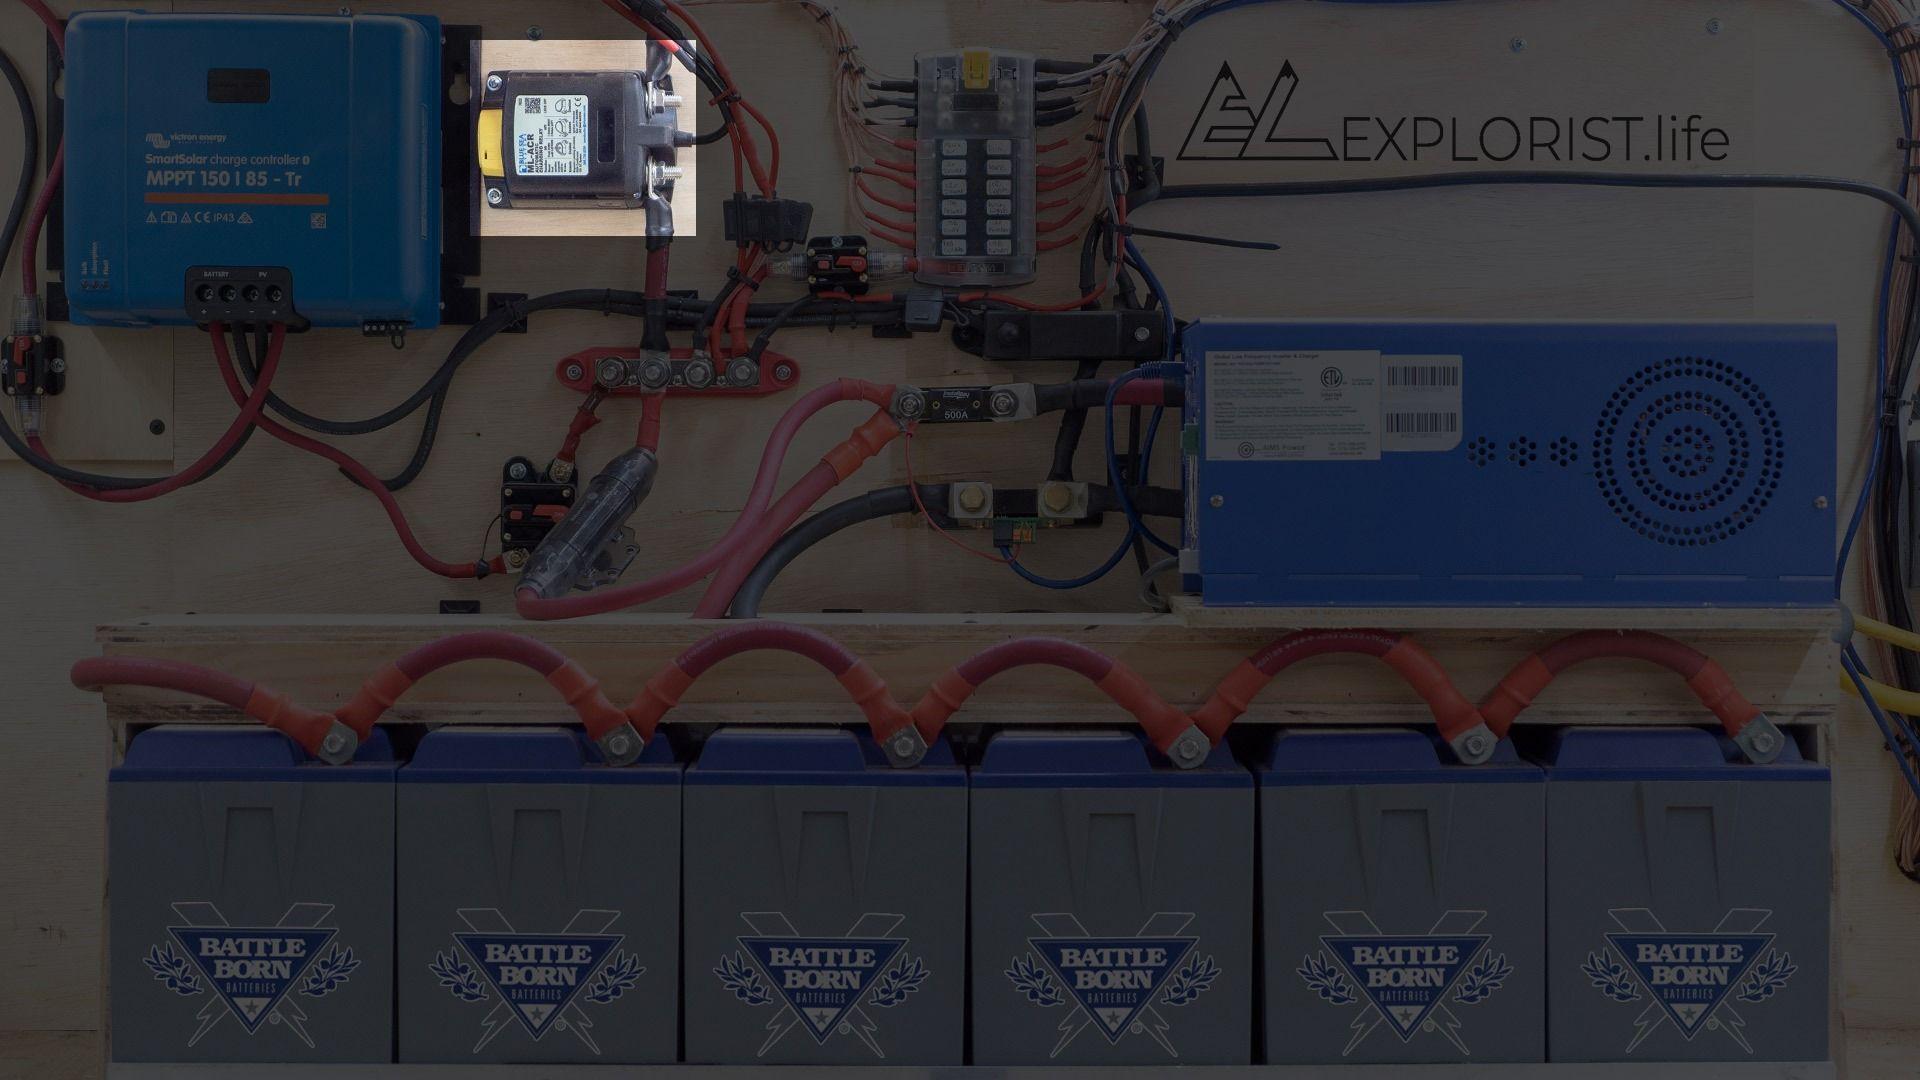 How To Design And Install Solar On A Camper Van Diy Camper Solar Solar Power Diy